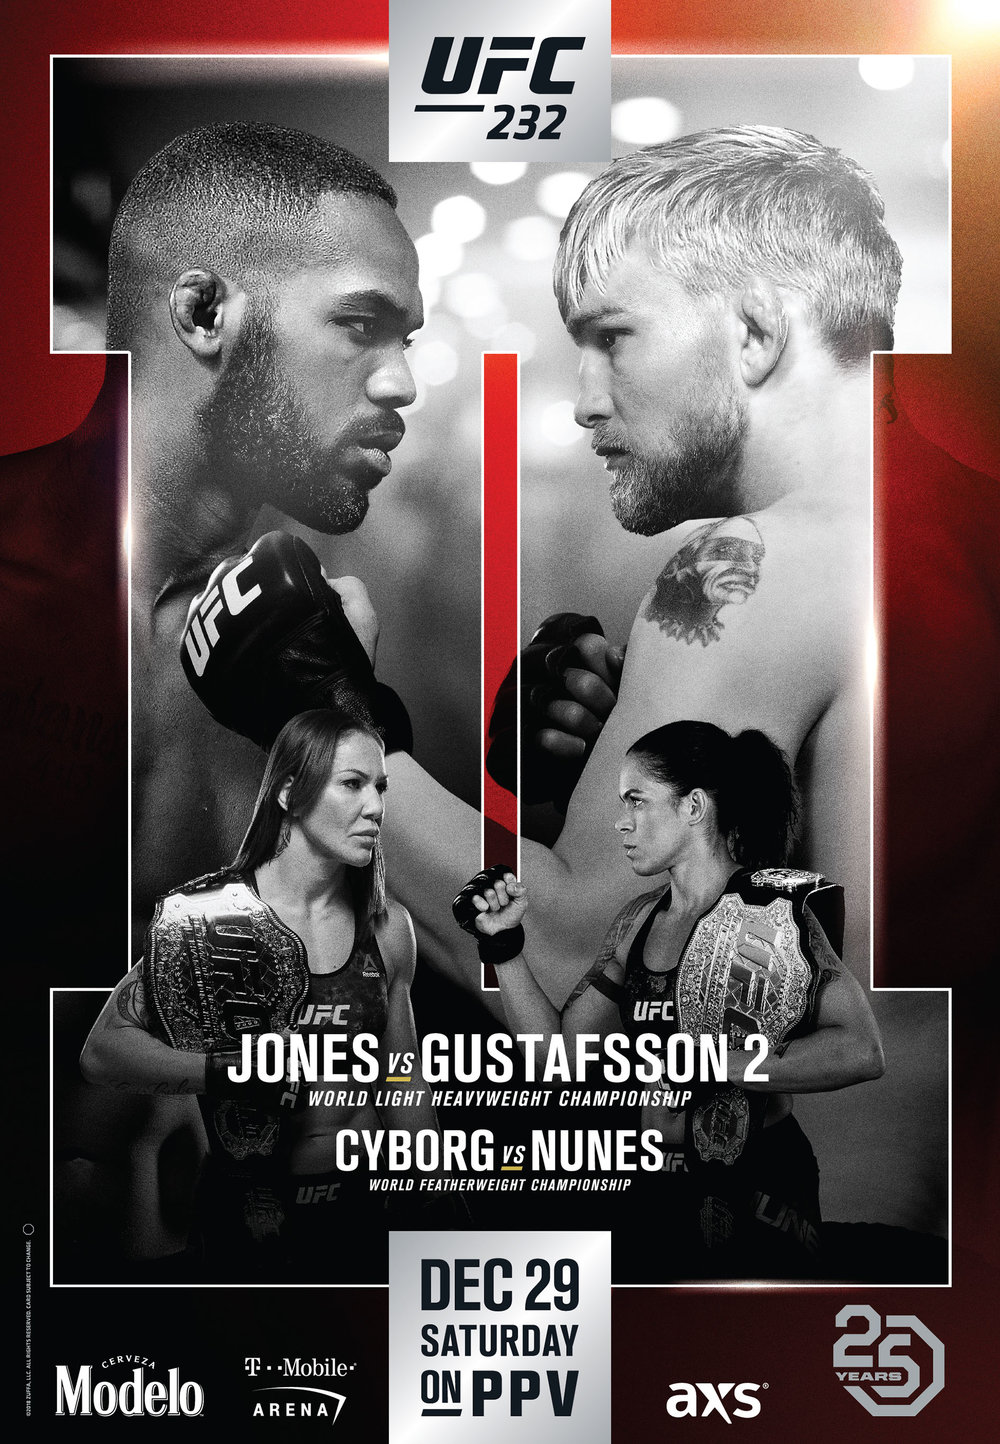 UFC_232_poster_english.jpg